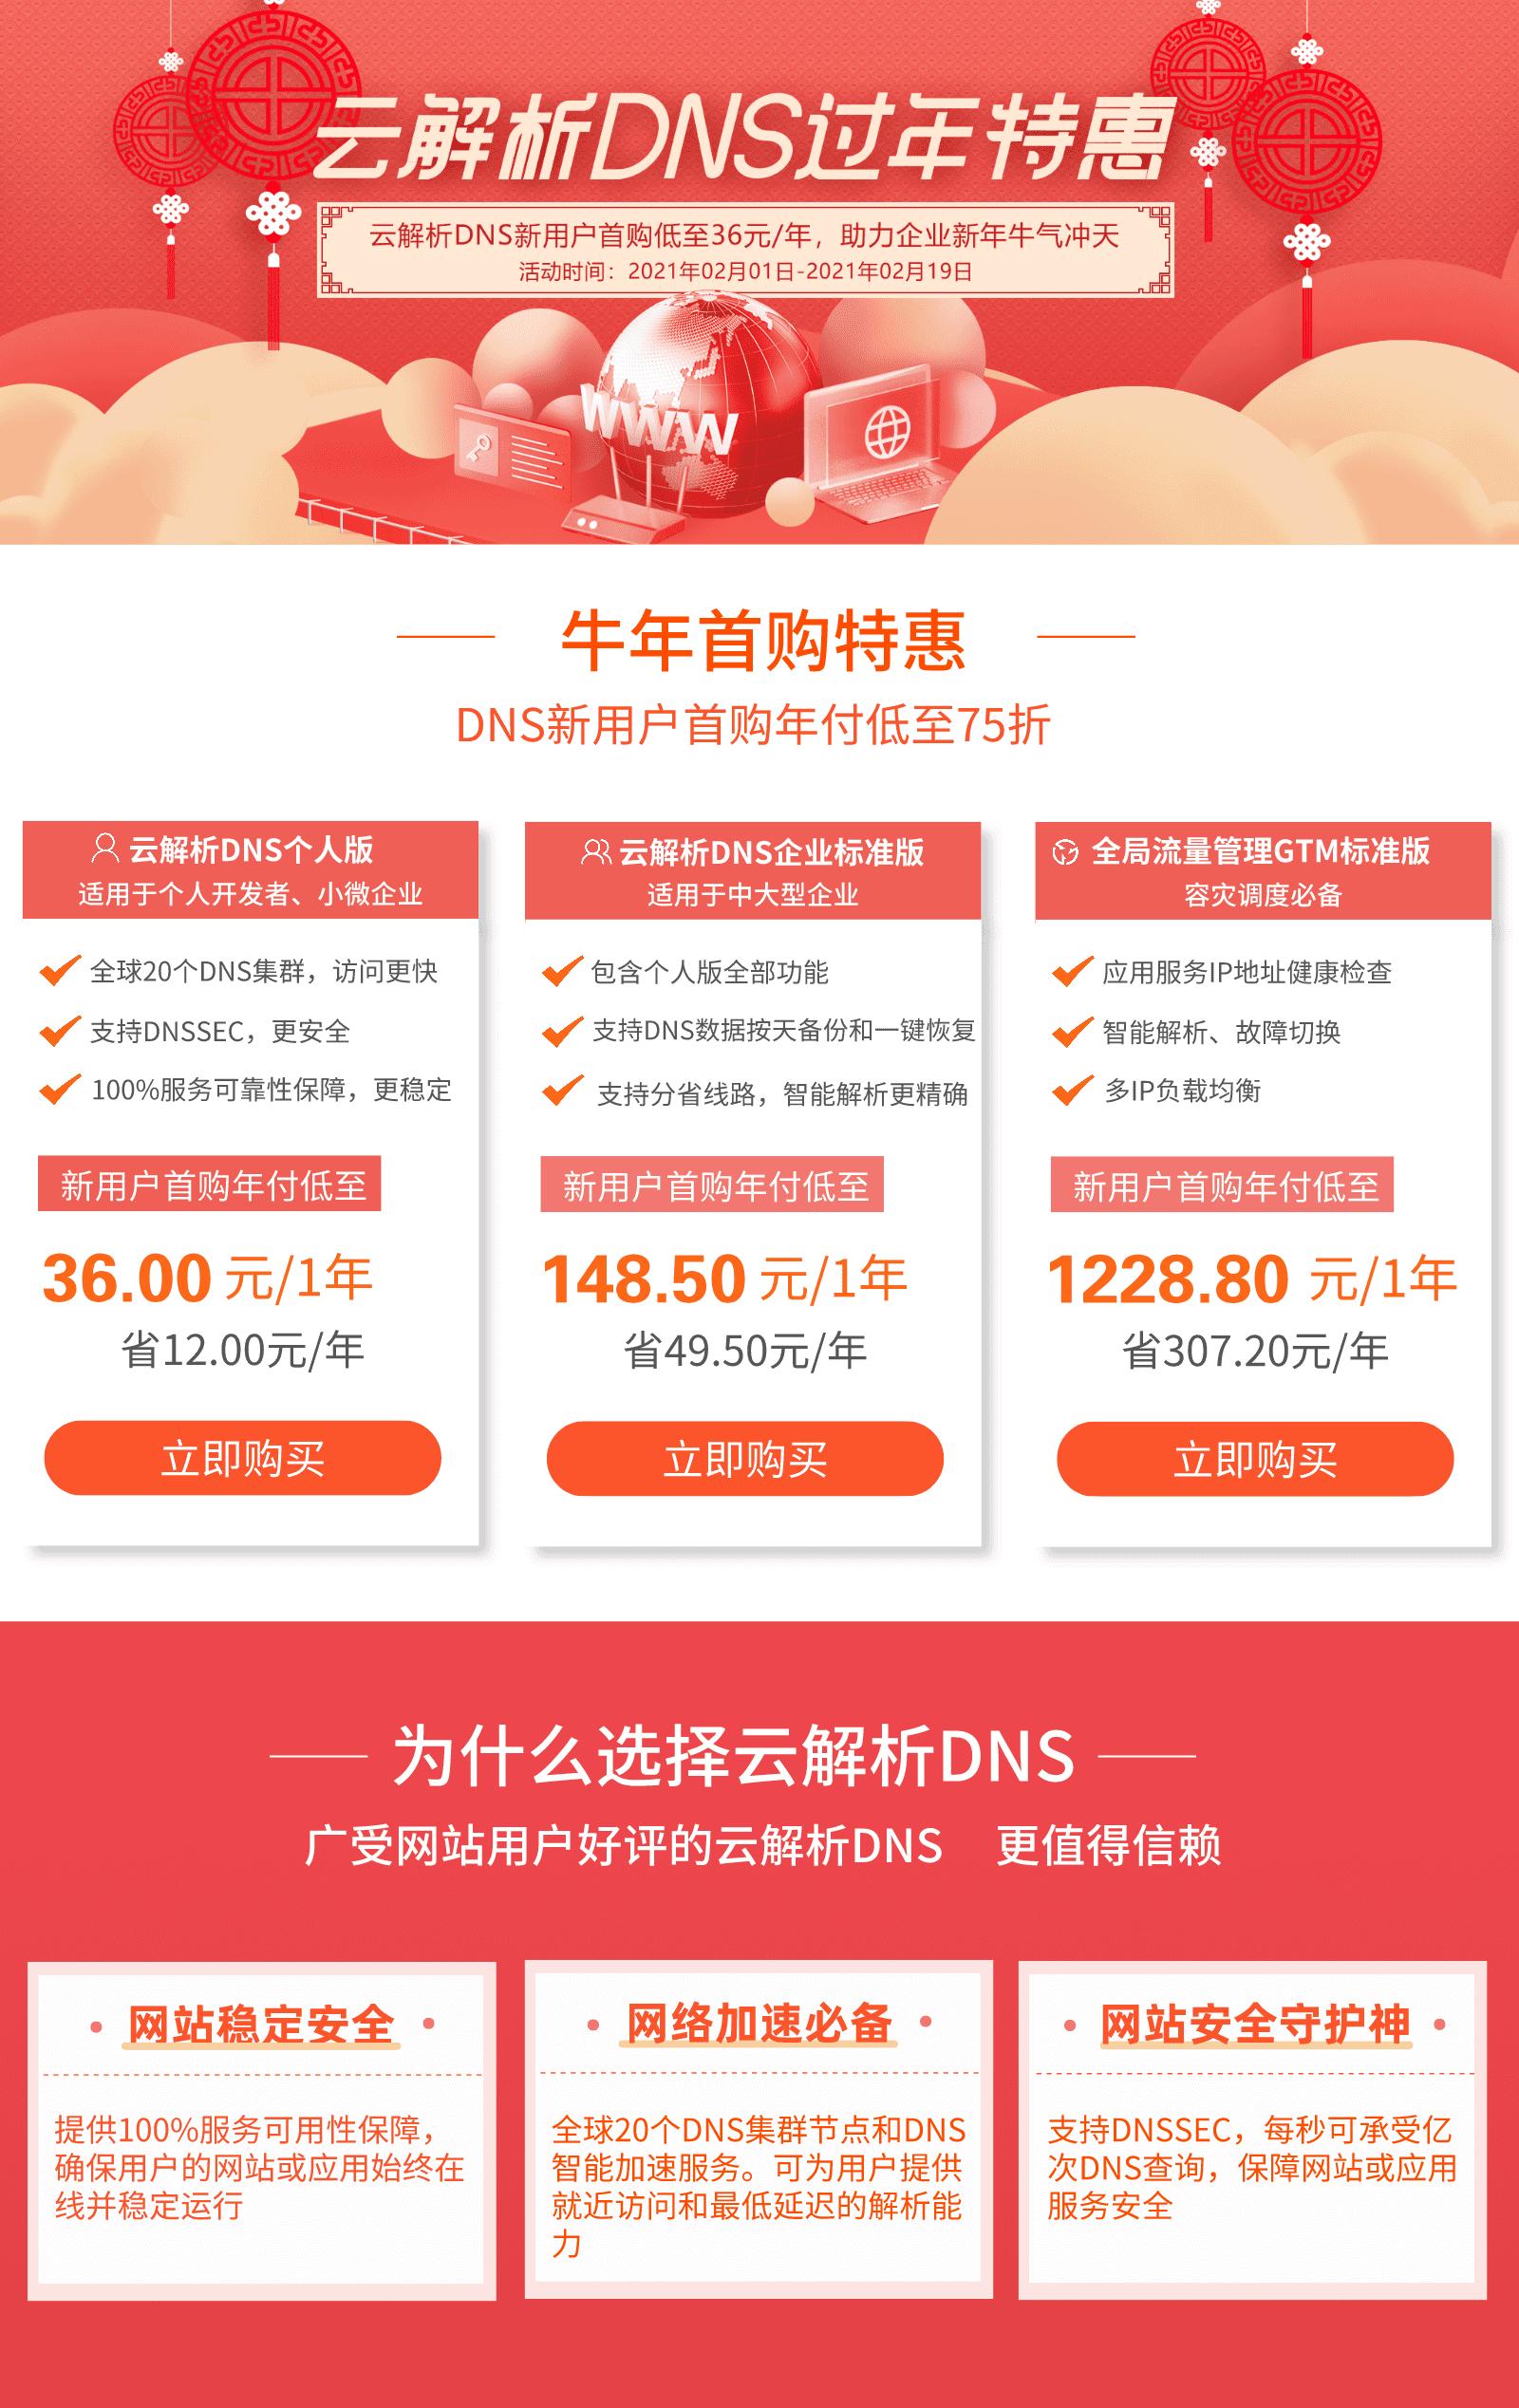 【DNS过年特惠】爆品低至36元/年,助力企业牛年业务牛气冲天!